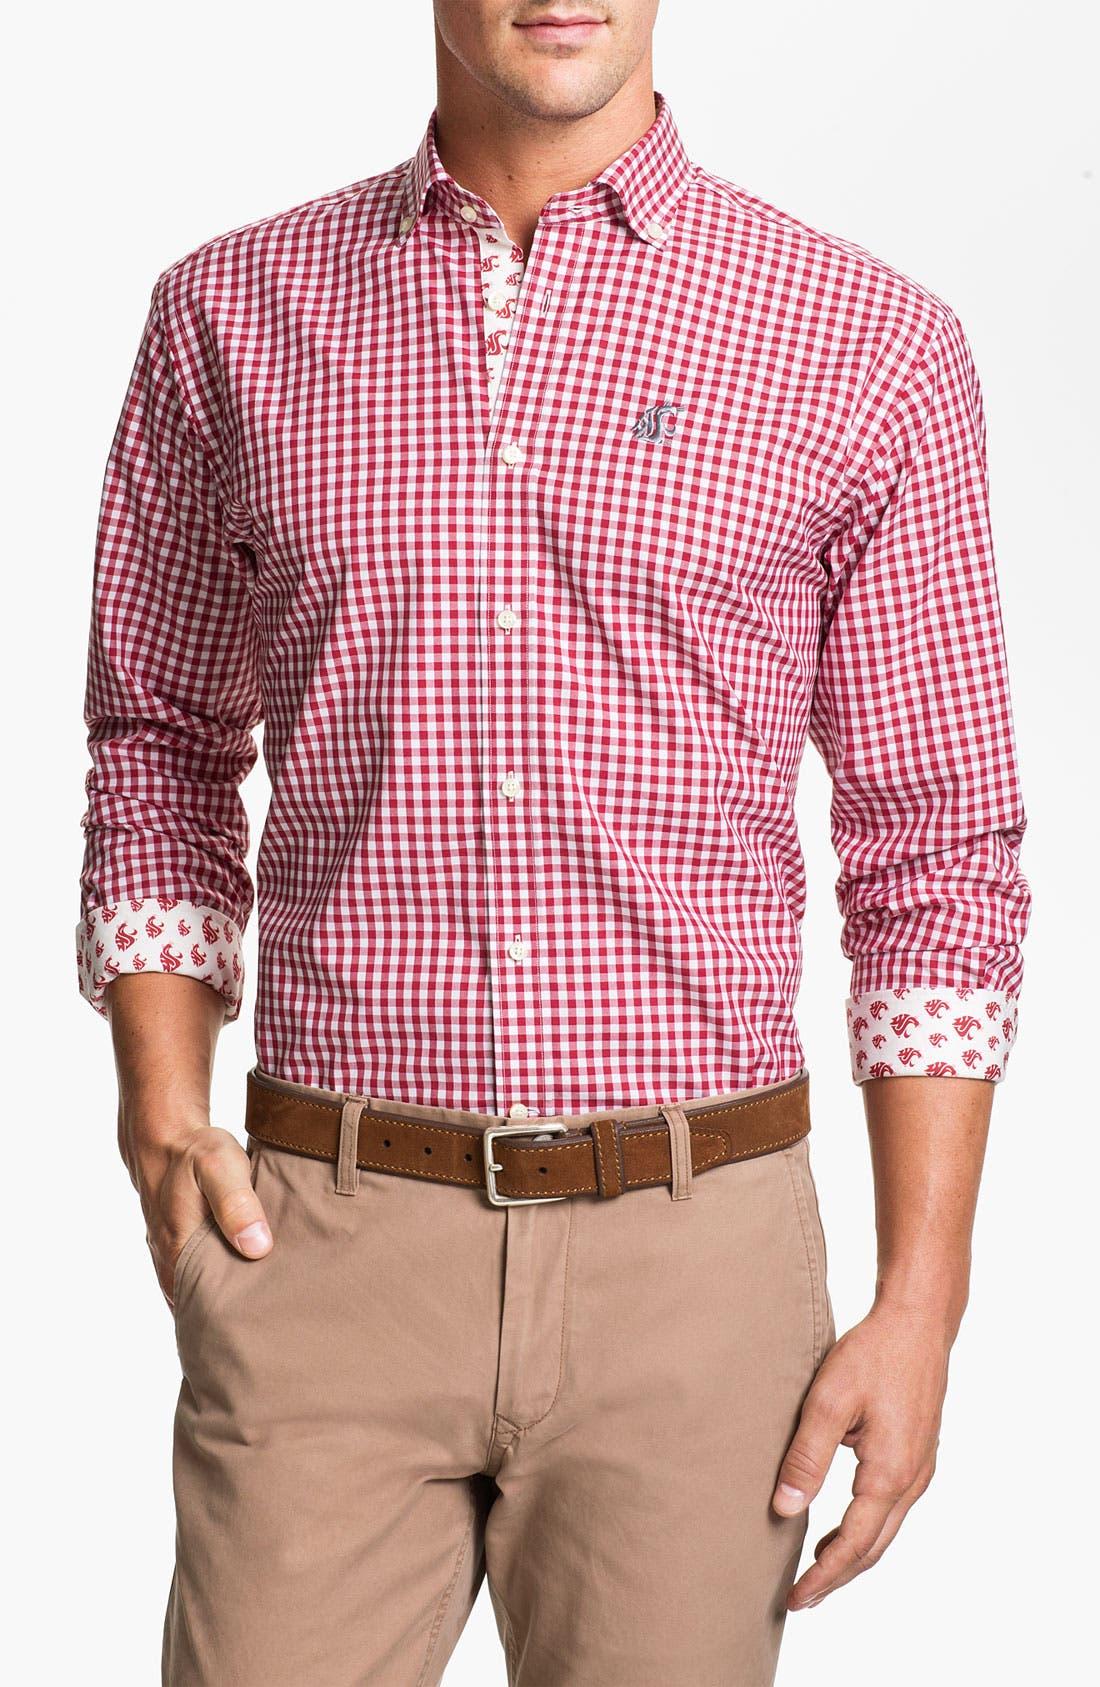 Alternate Image 1 Selected - Thomas Dean 'Washington State University' Gingham Sport Shirt